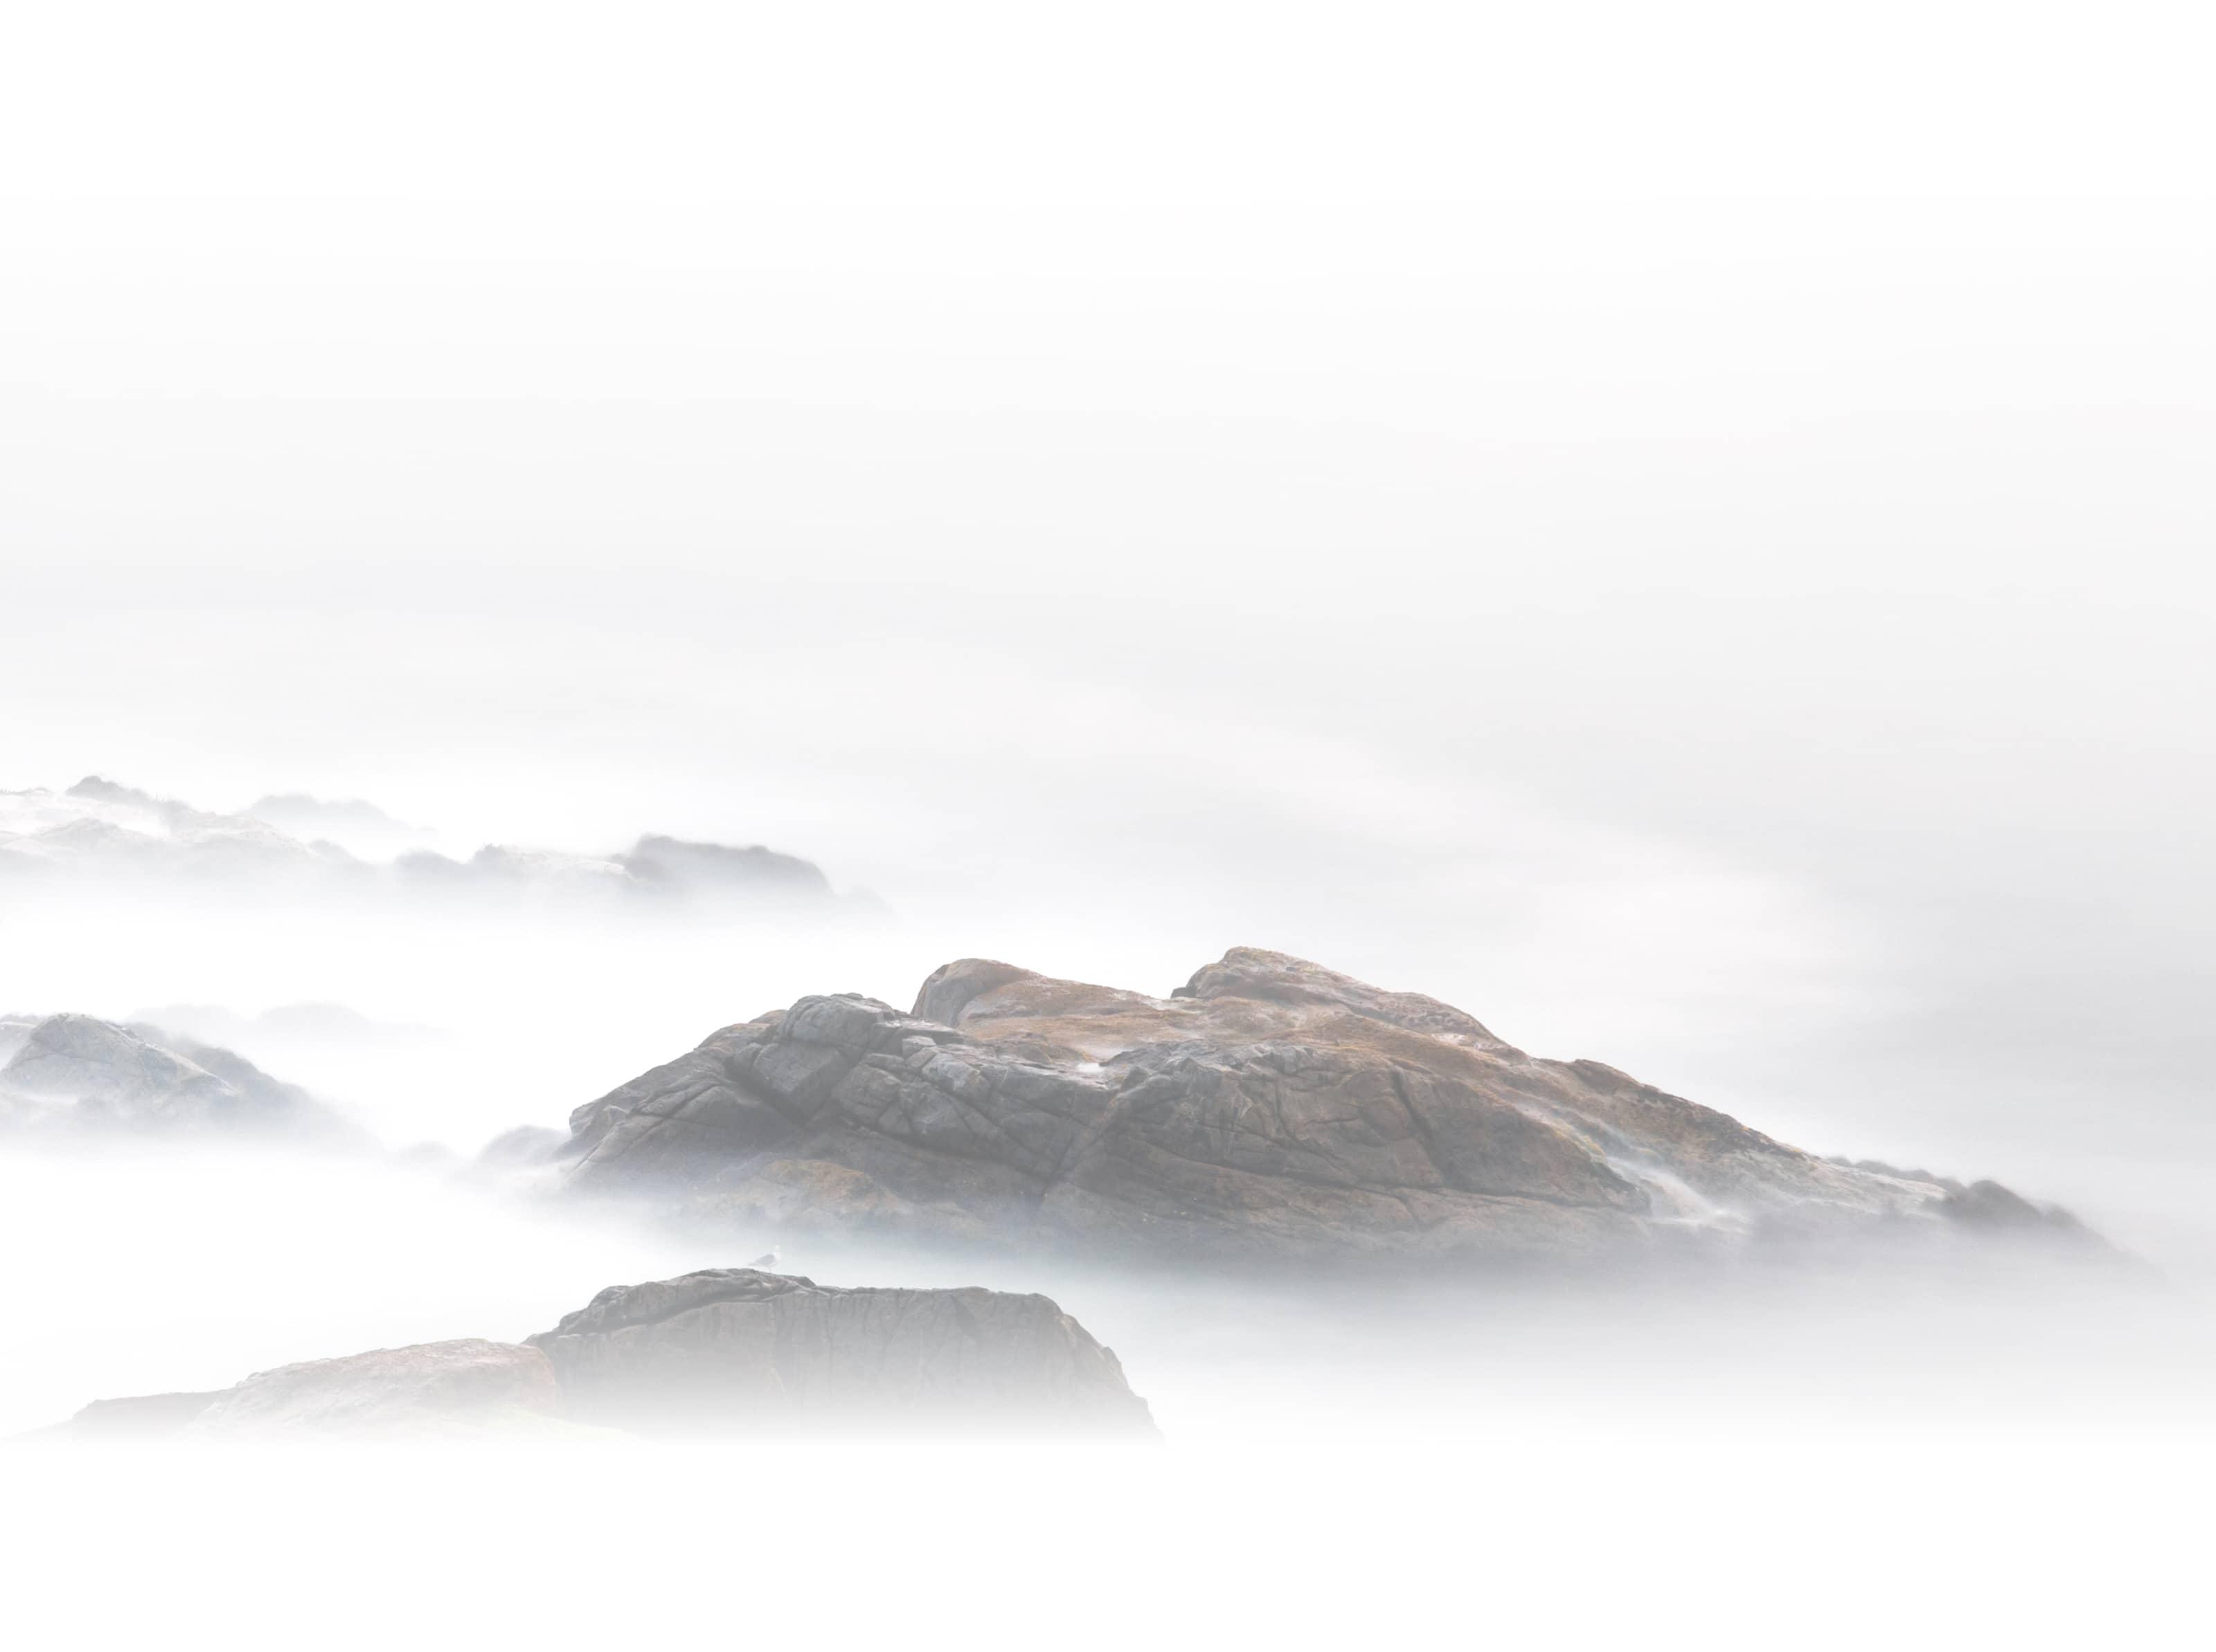 foggy-mountains-bg